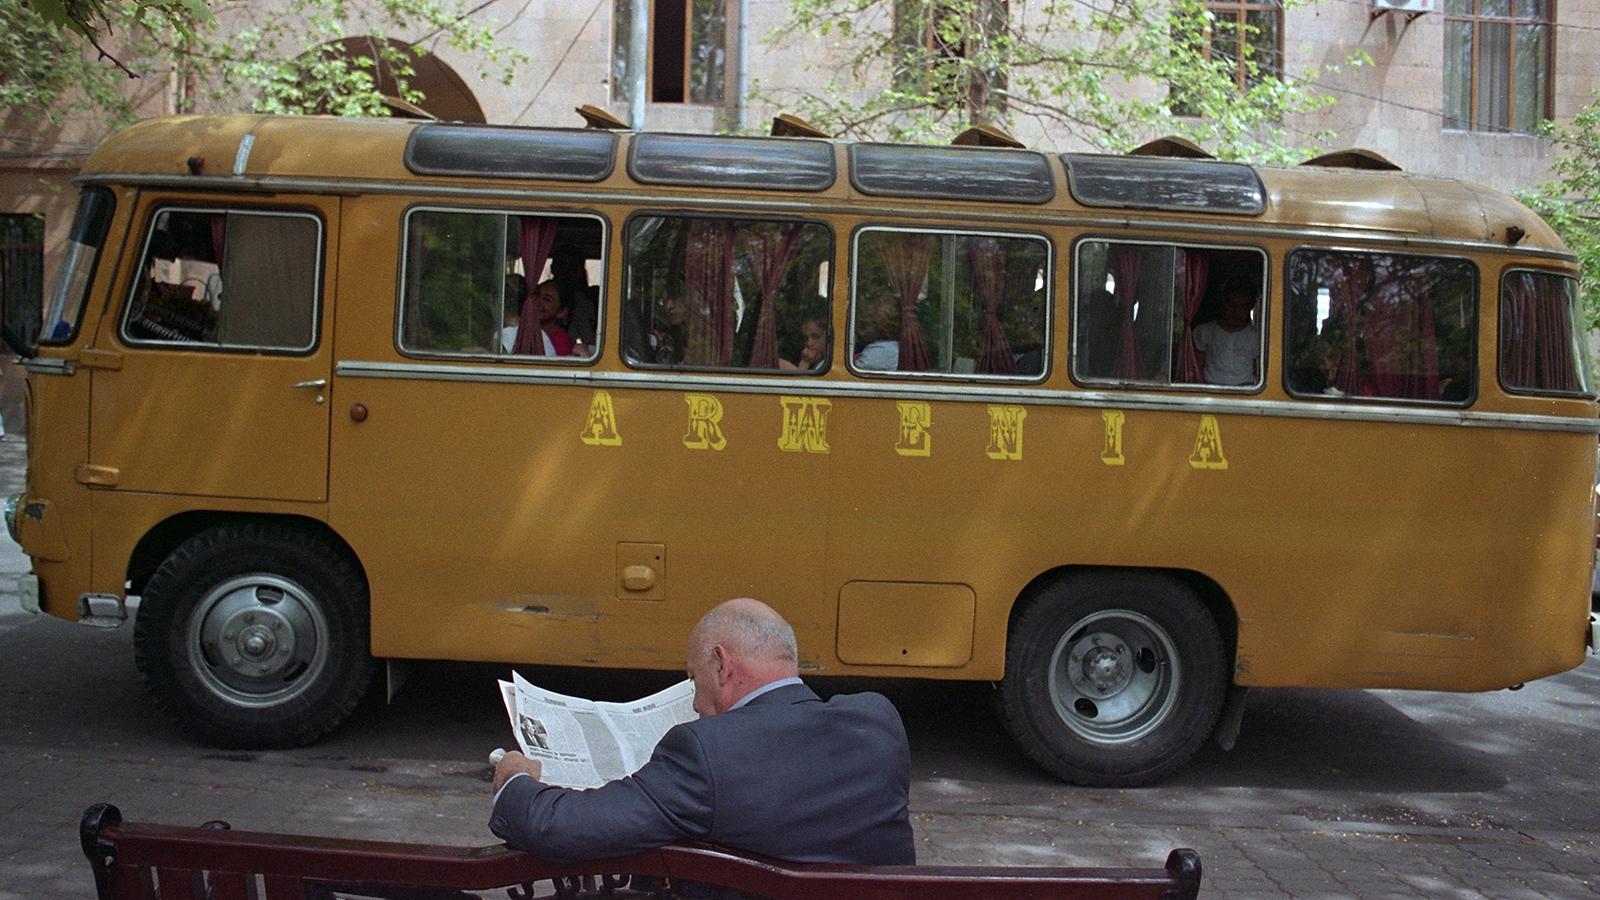 Yerevan schoolbus and street scene